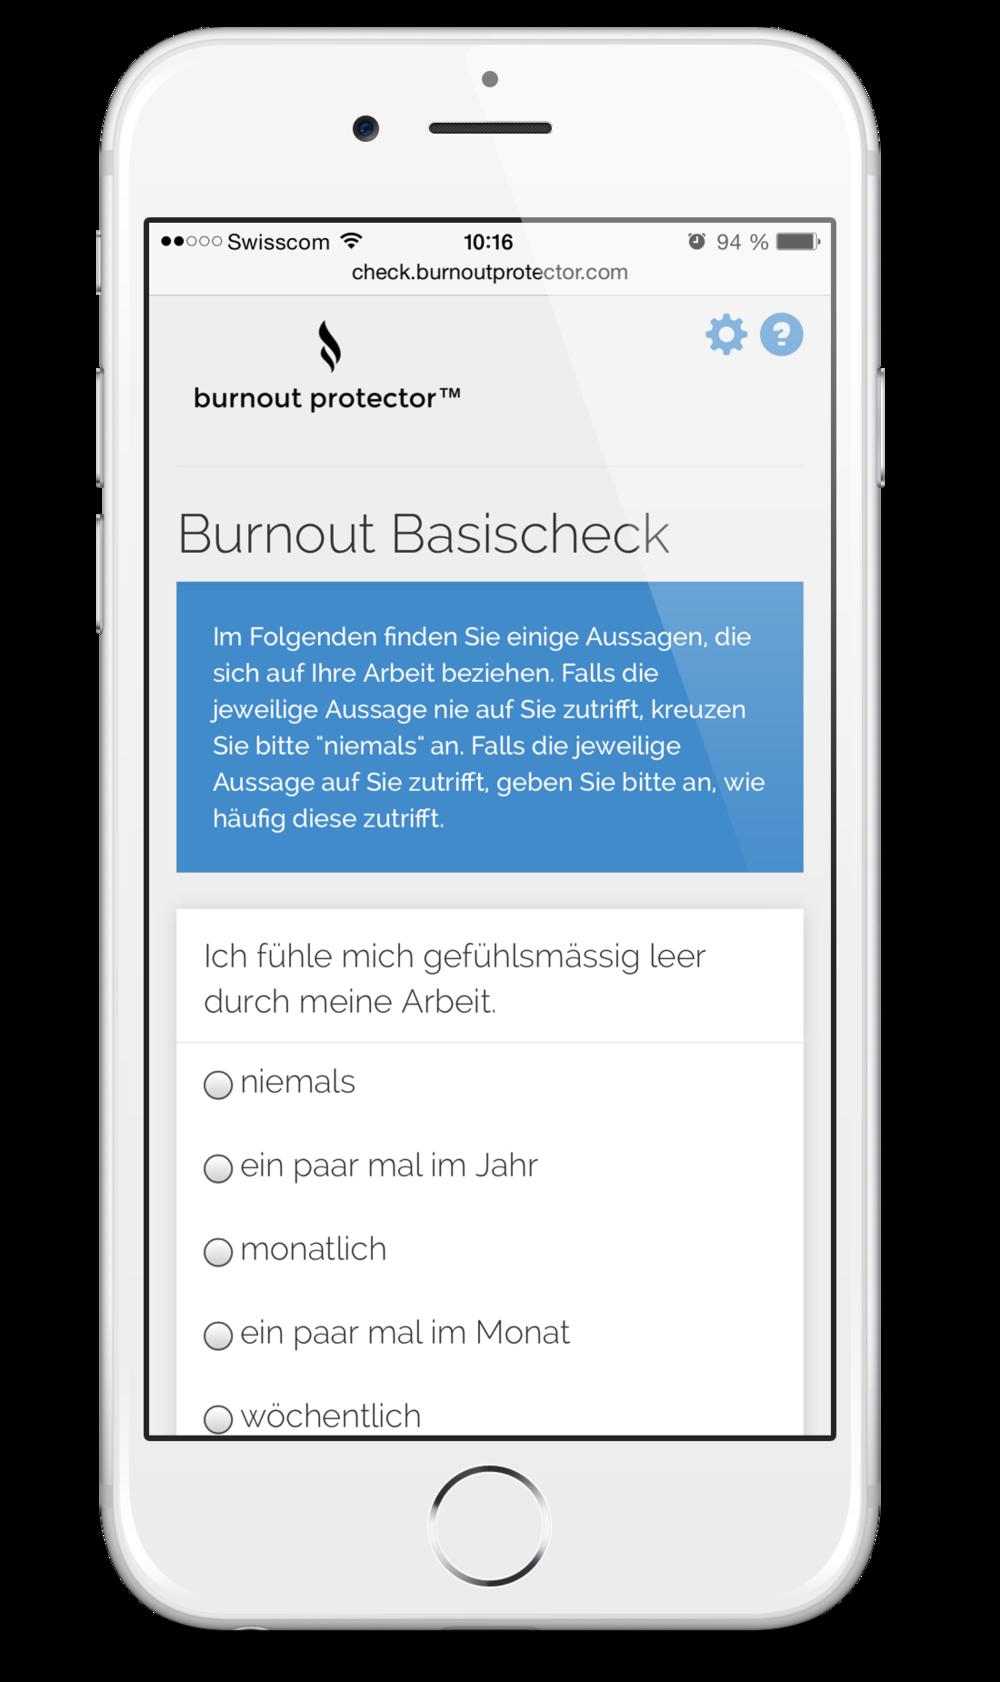 Burnout Risiko Test  BRIX™ (Burnout Basis Check)